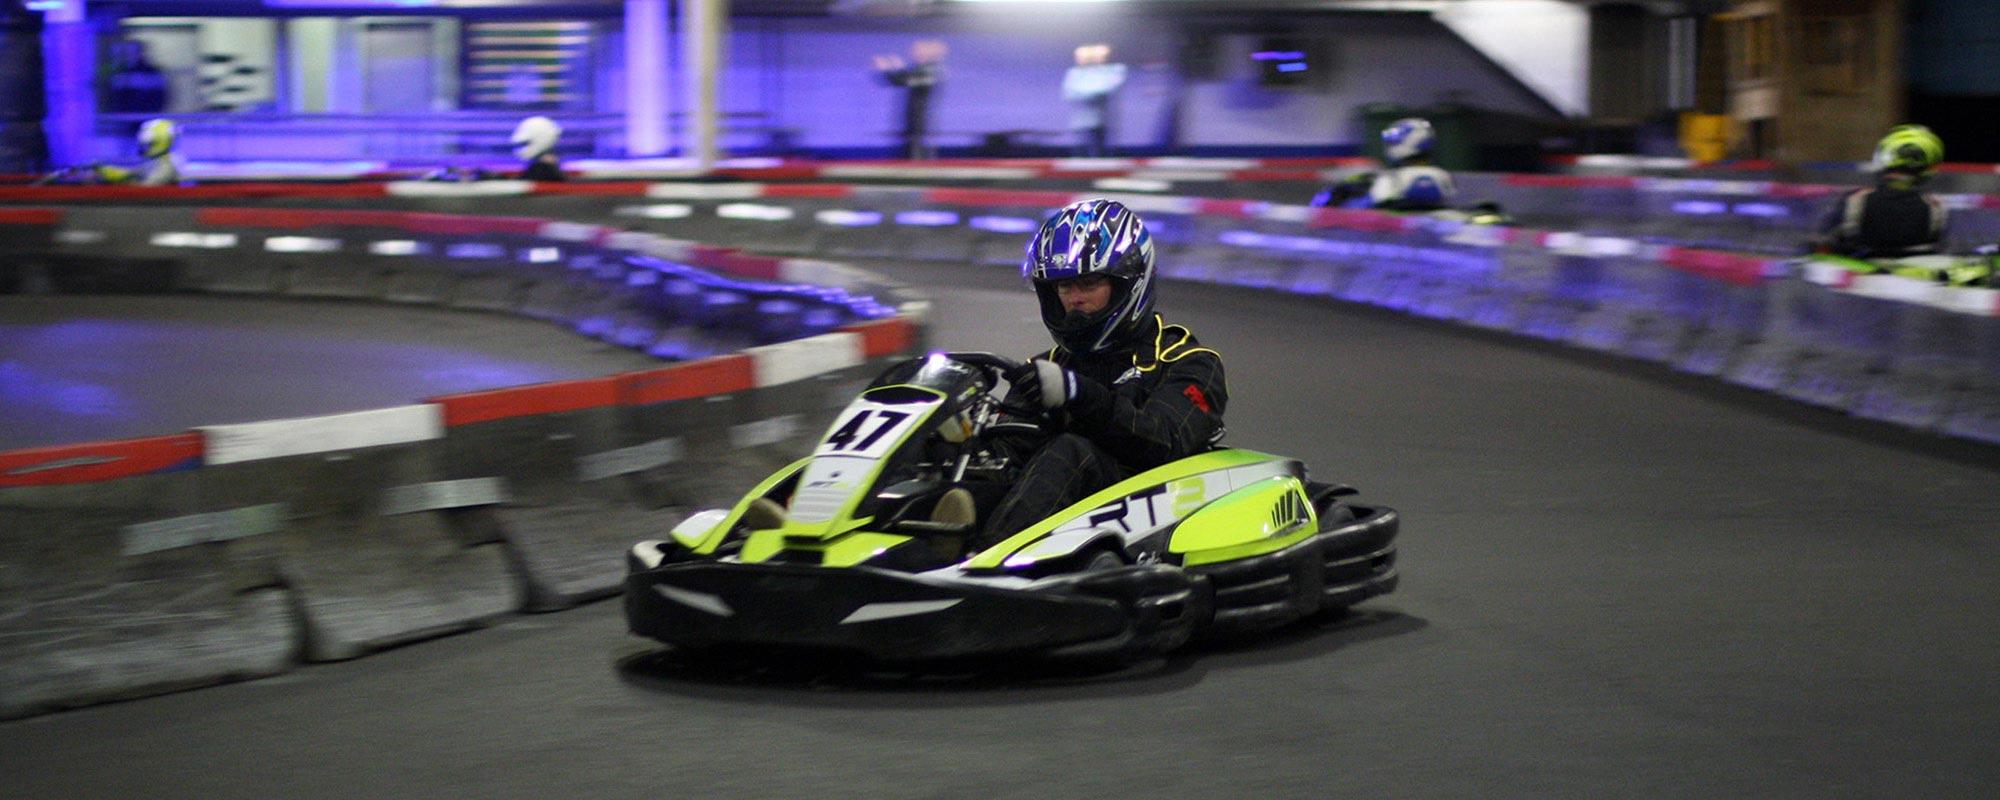 ebafkc-karting-2000x800-03